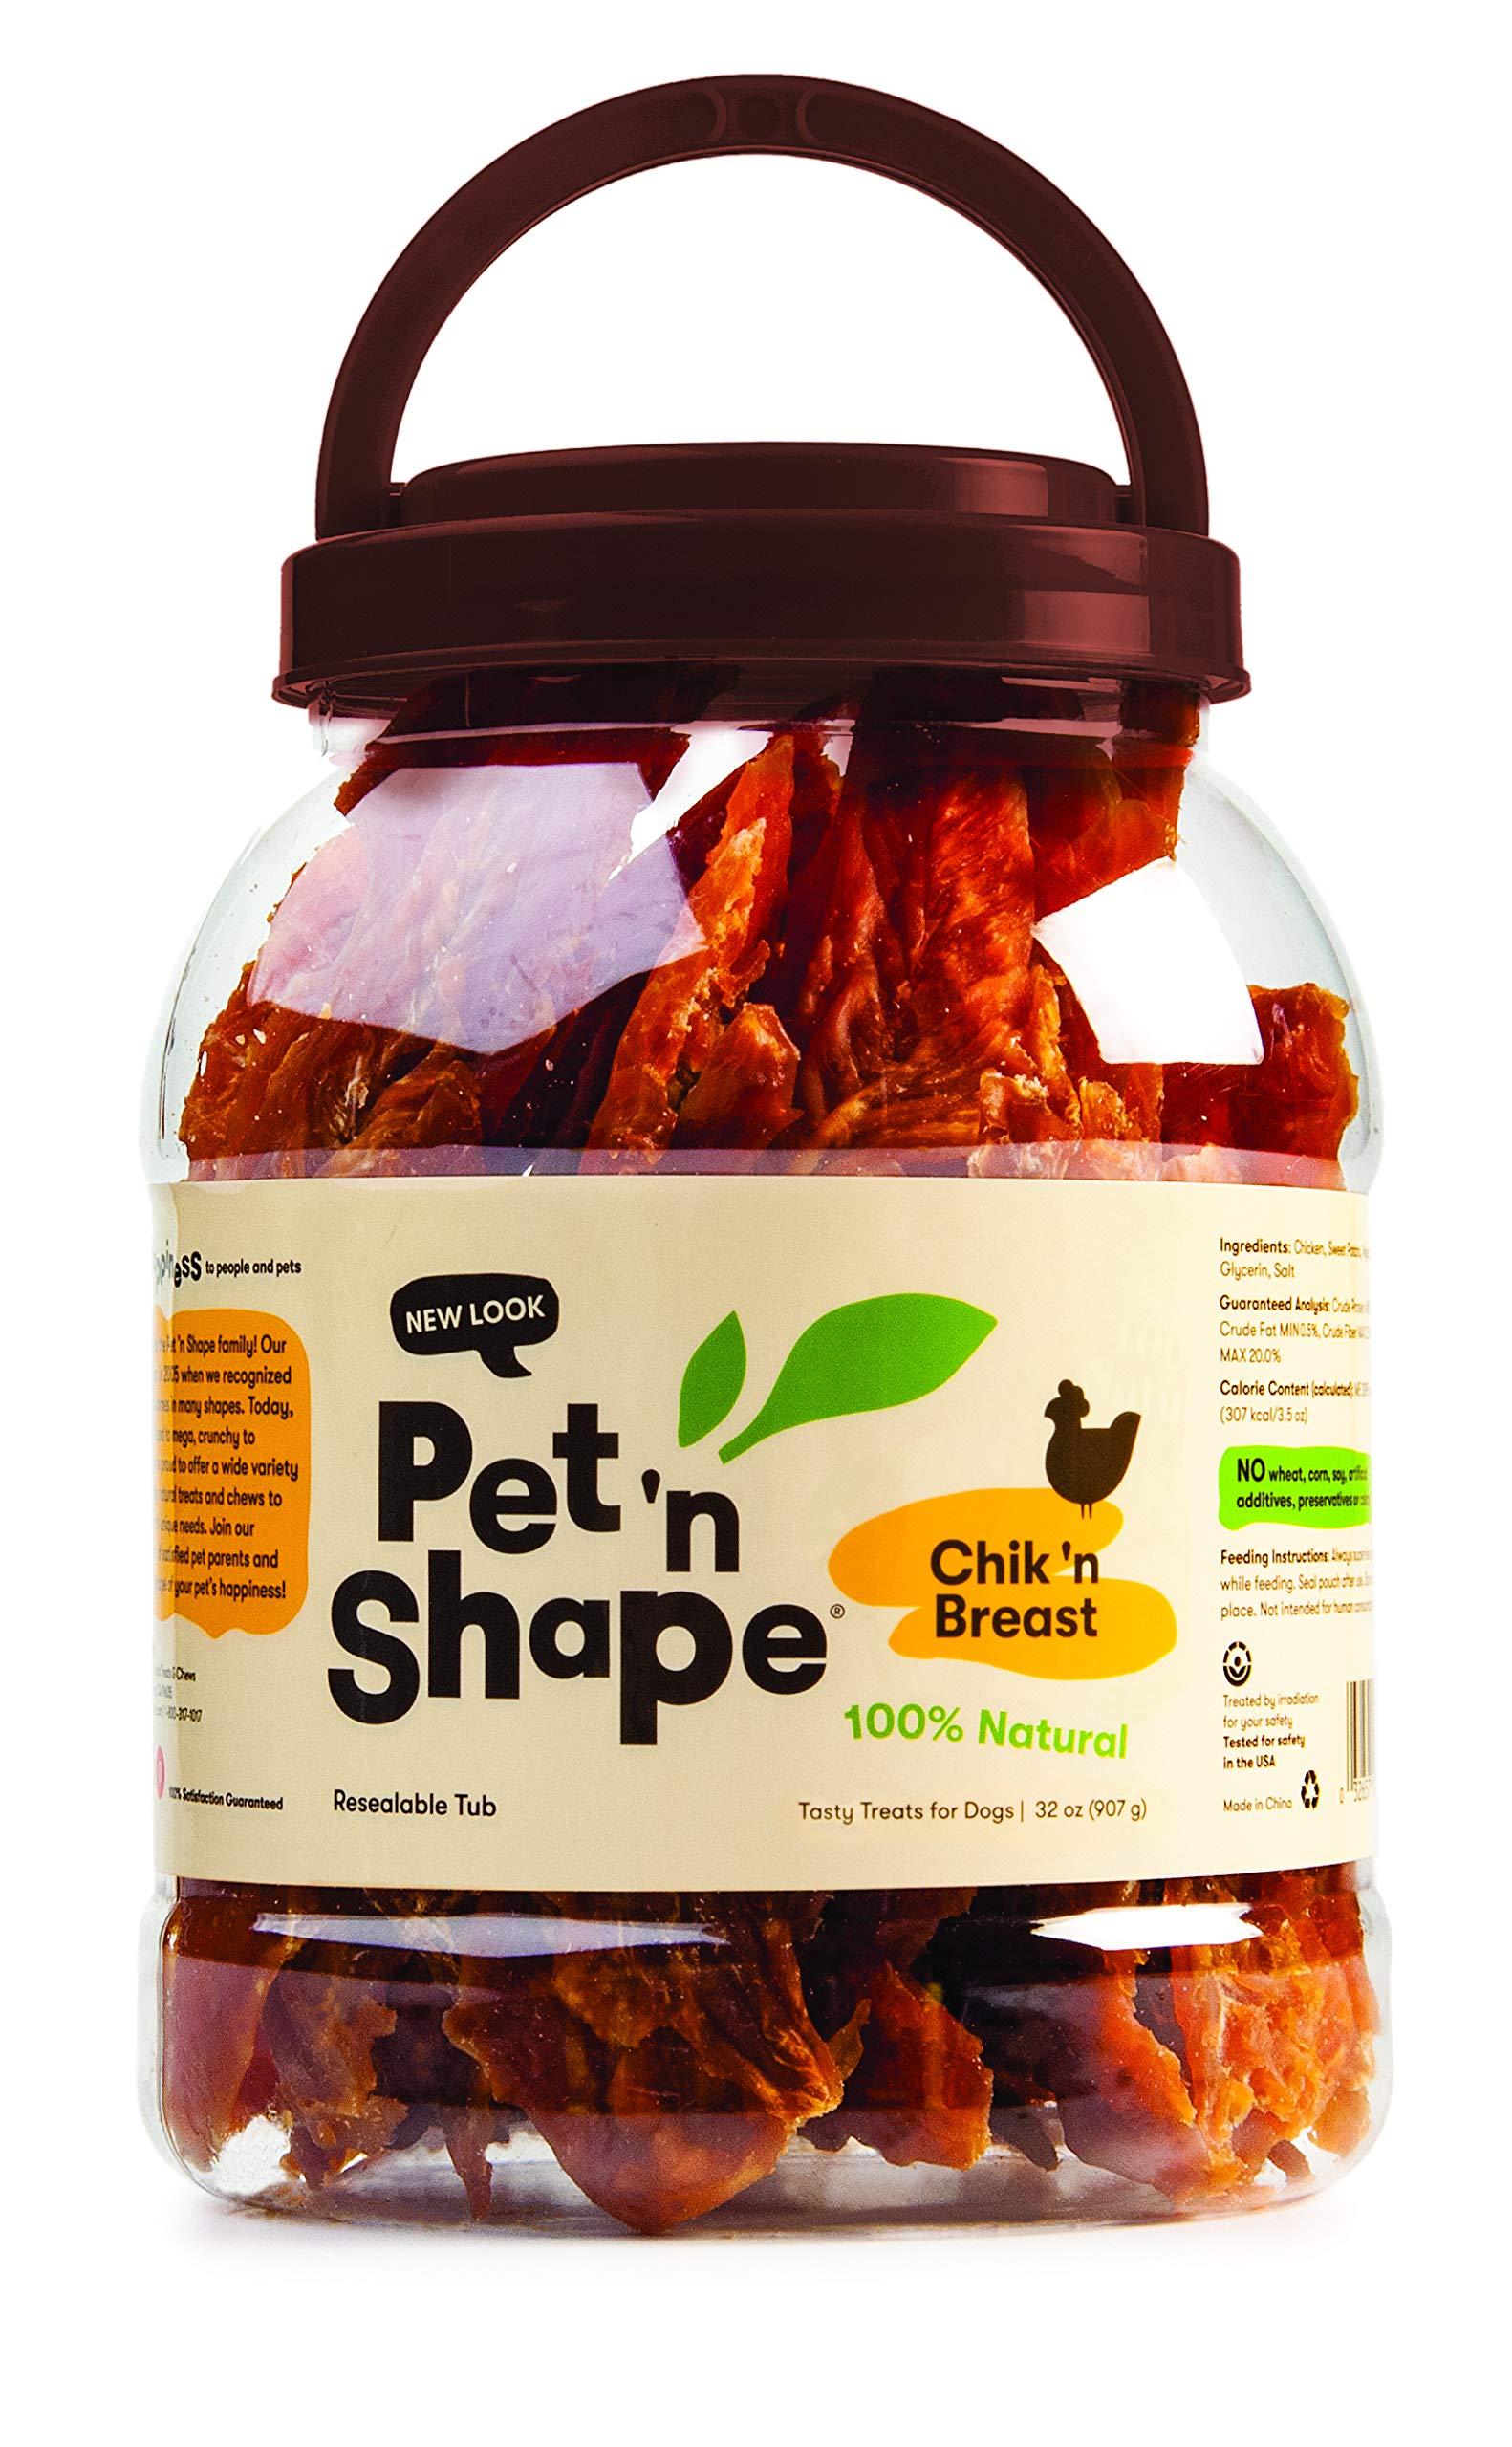 Pet 'n Shape - Chik 'n Breast - 100-Percent Natural Chicken Jerky Dog Treats, 2-Pound